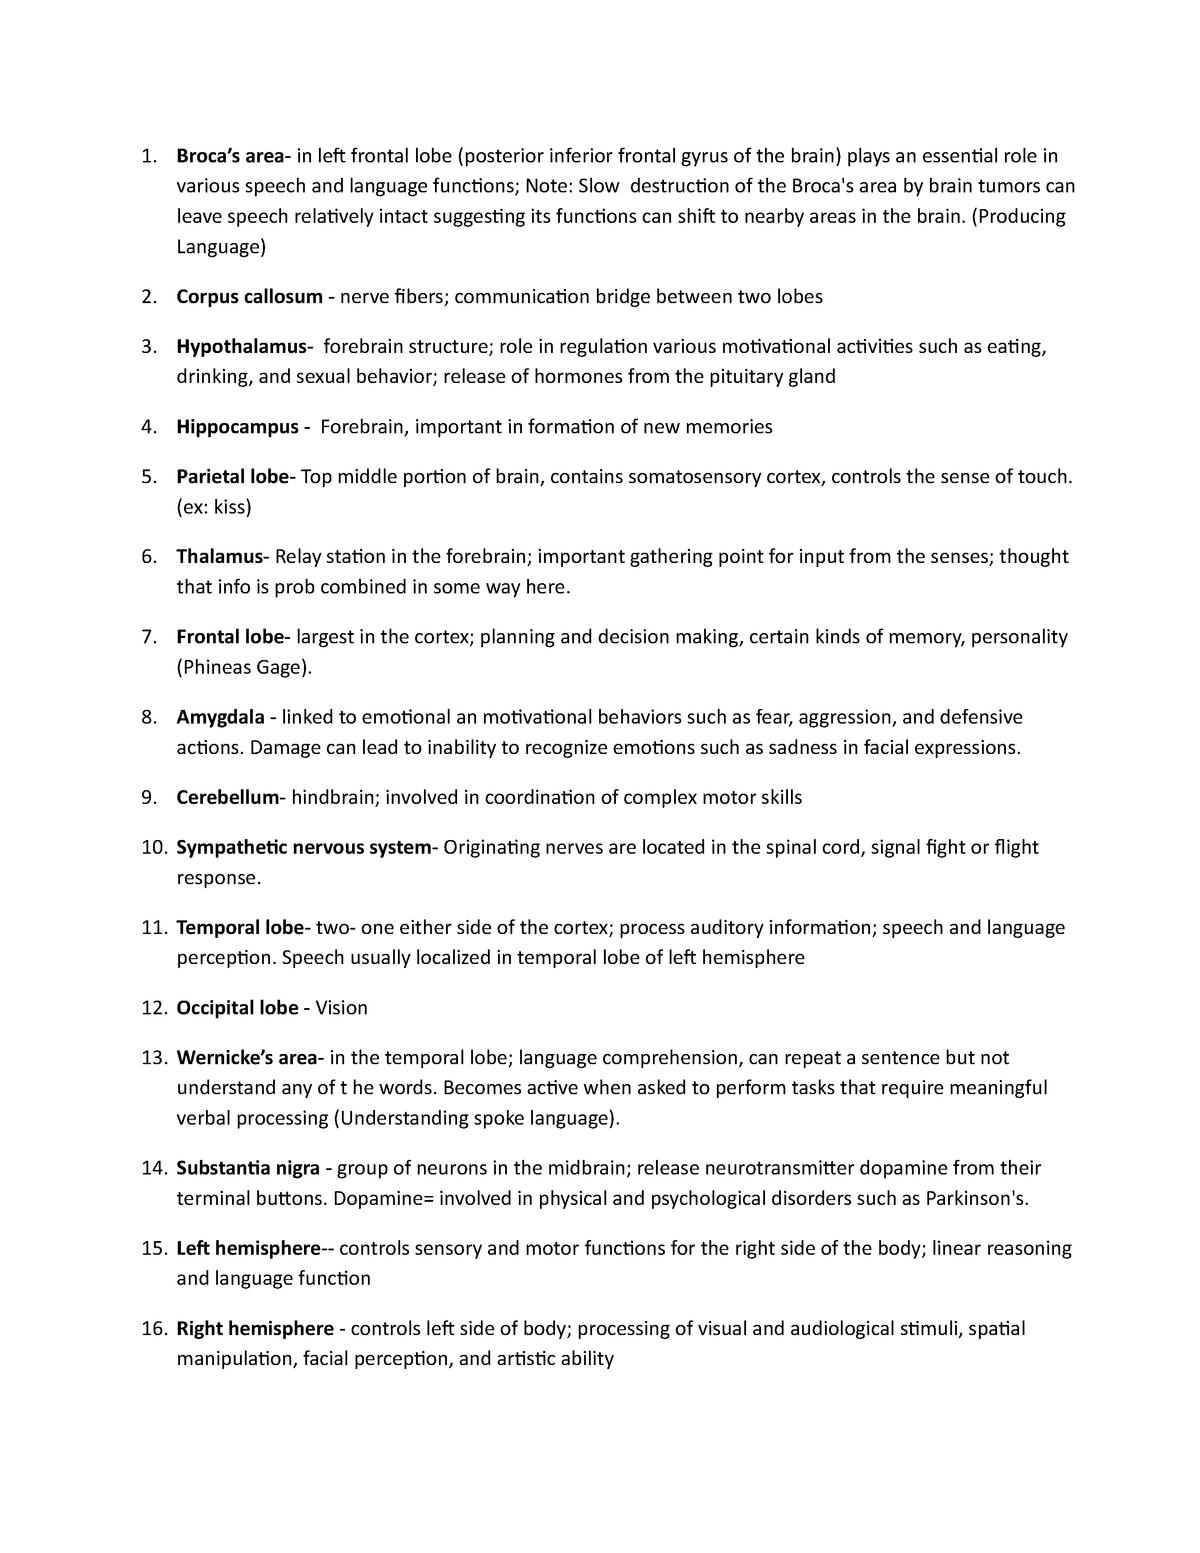 Brain regions cheat sheet - PSY 12000: Elementary Psychology